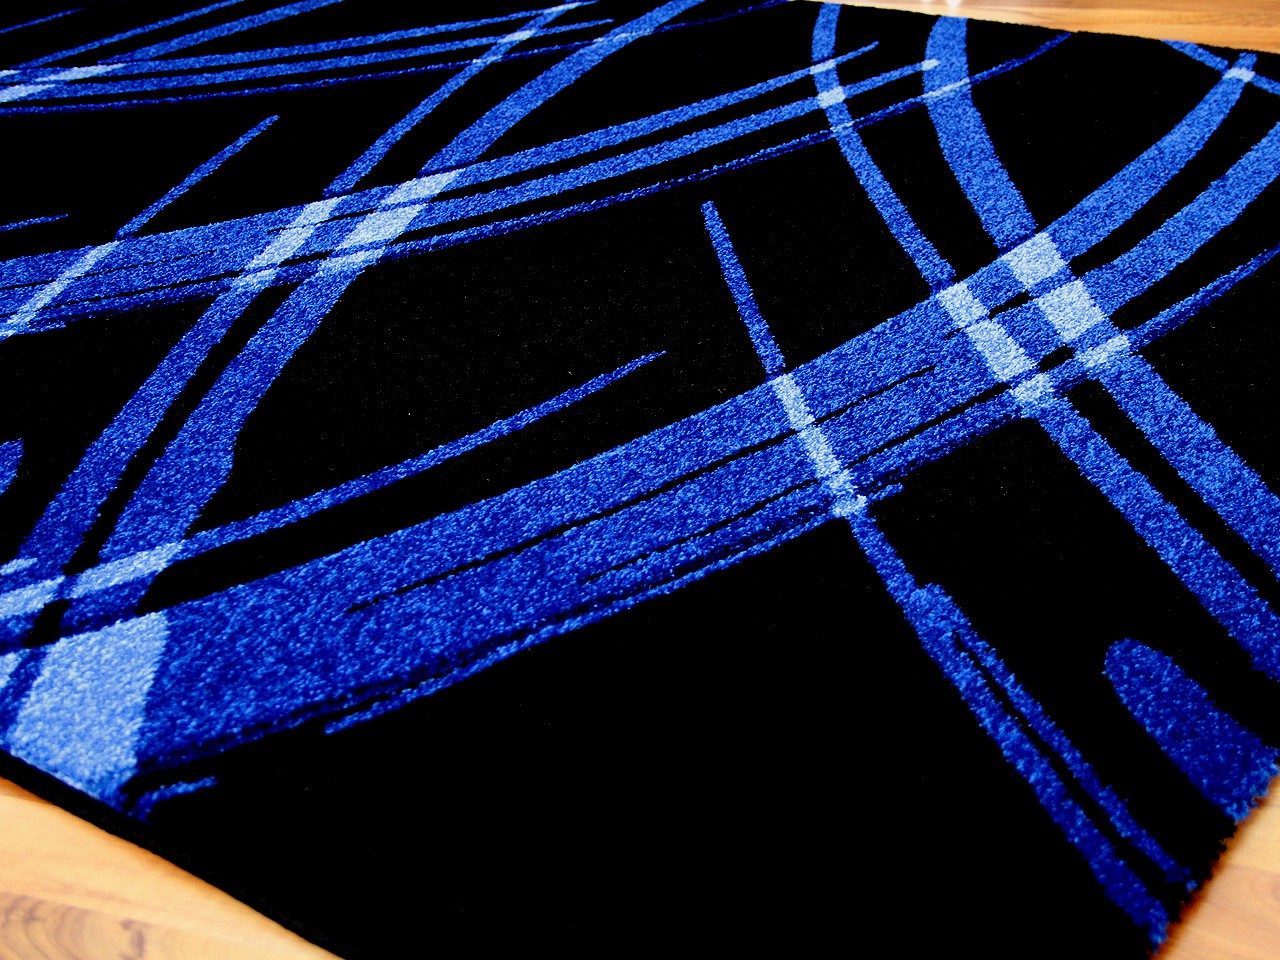 designer teppich maui schwarz blau life in 5 gr en teppiche designerteppiche maui teppiche. Black Bedroom Furniture Sets. Home Design Ideas